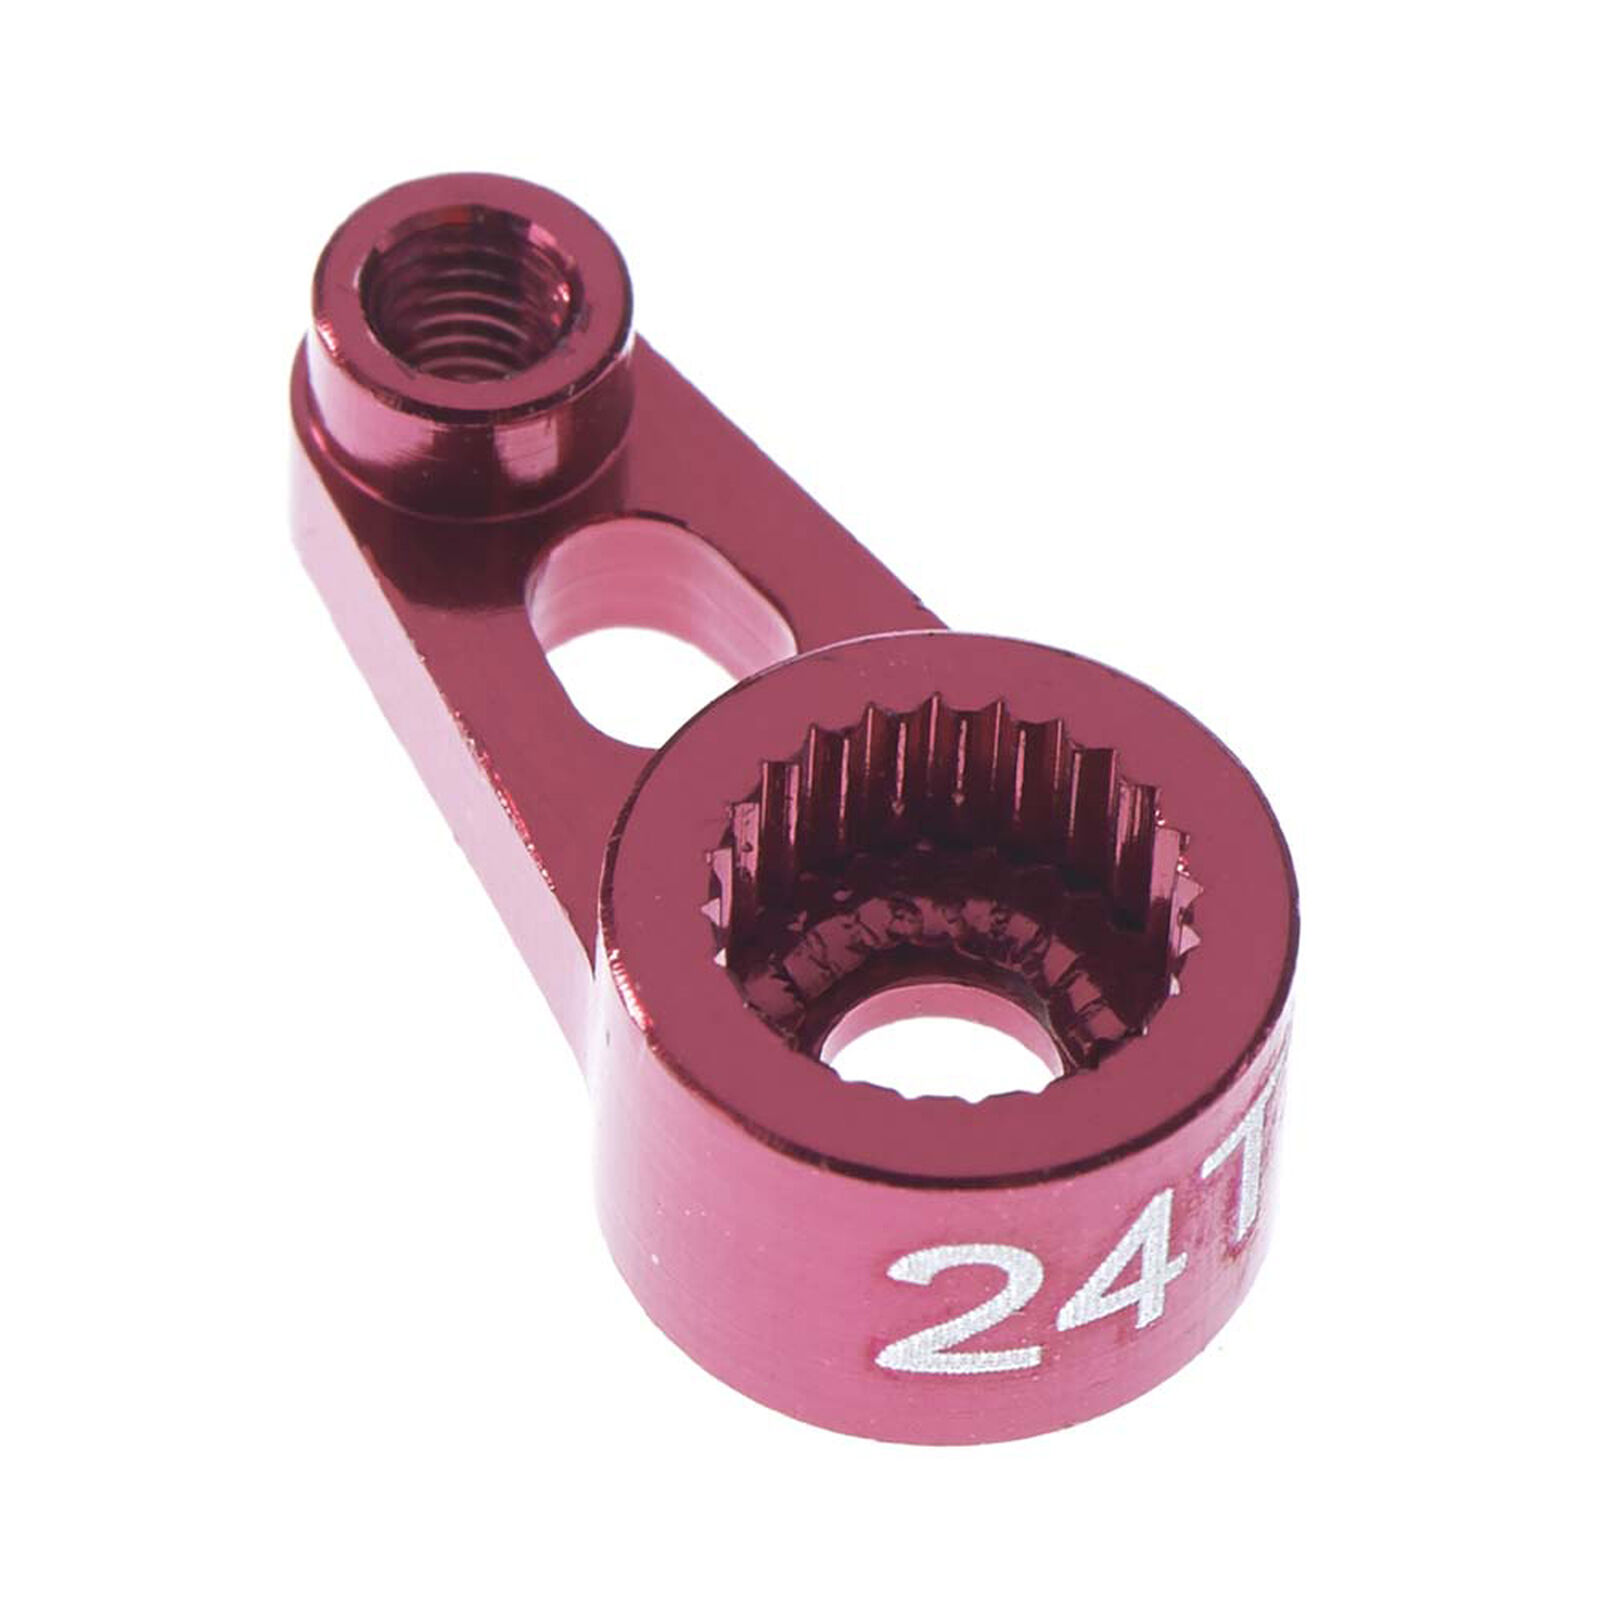 Aluminum Servo Horn, Red 24T: 1/16 Traxxas